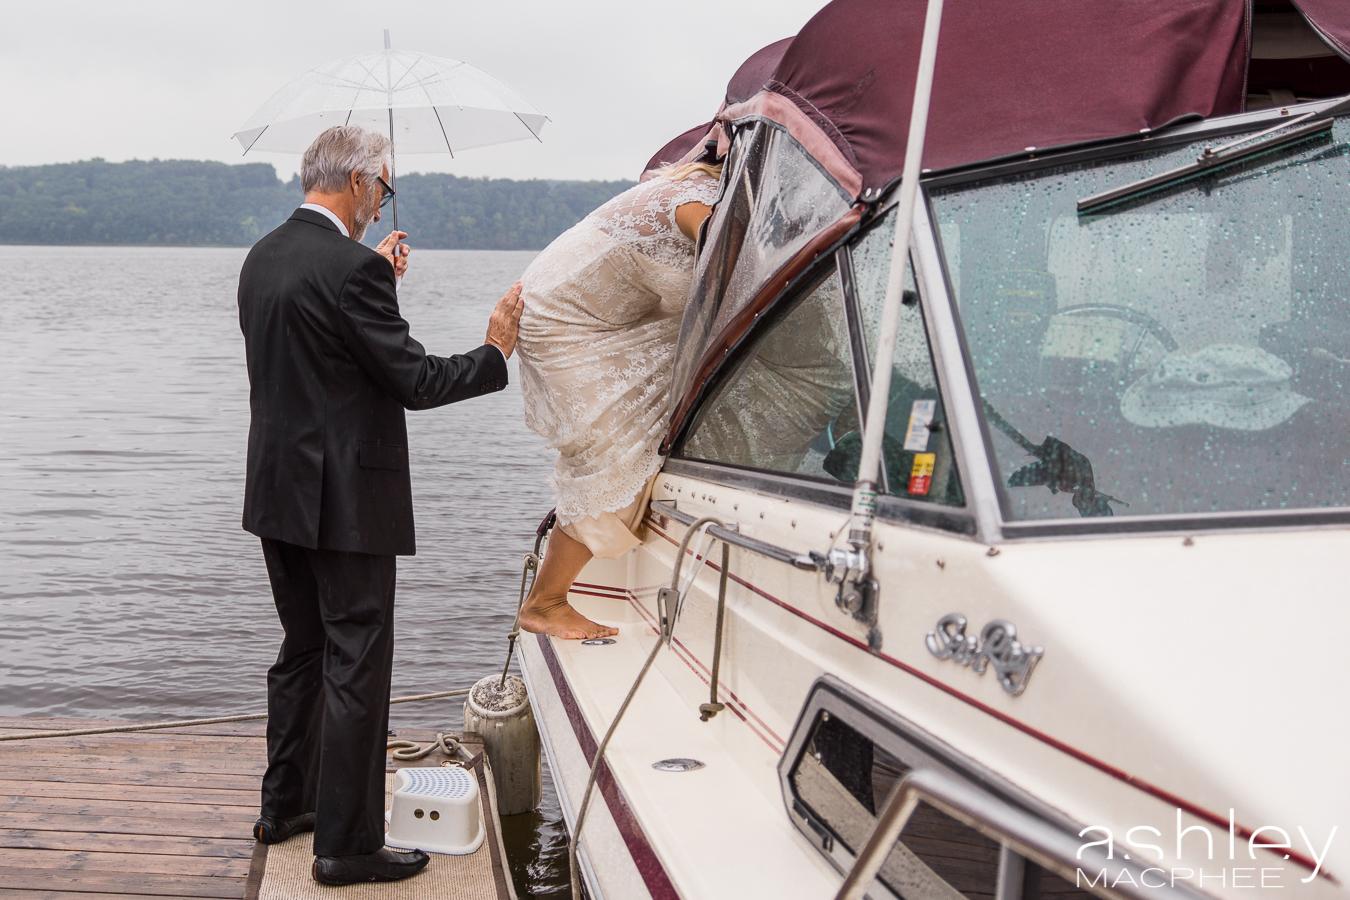 Ashley MacPhee Photography Hudson Yacht Club wedding photographer (31 of 112).jpg